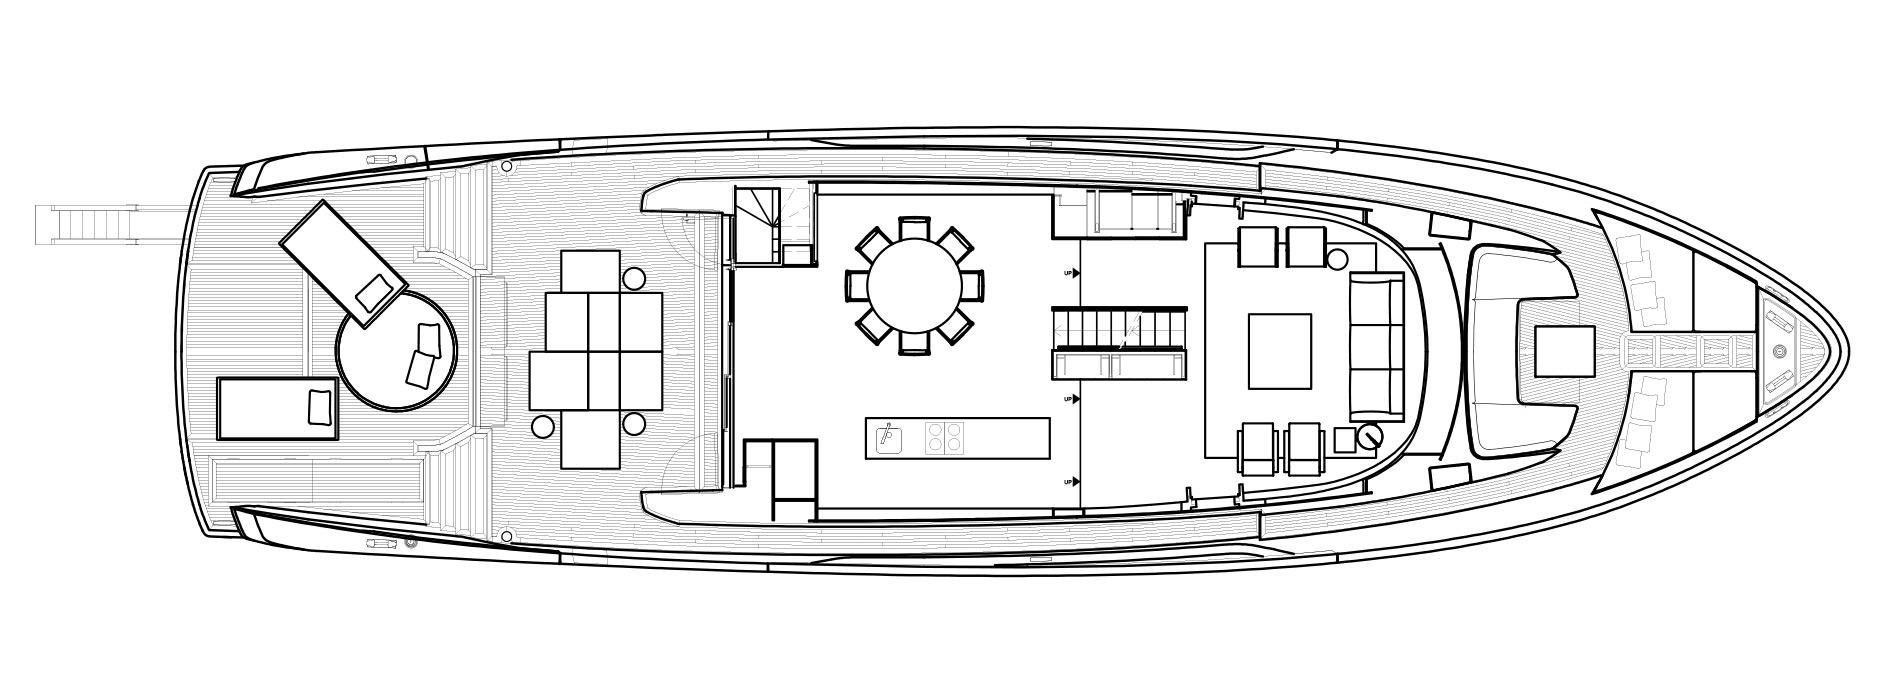 Sanlorenzo Yachts SX88 主甲板 Versione Lissoni